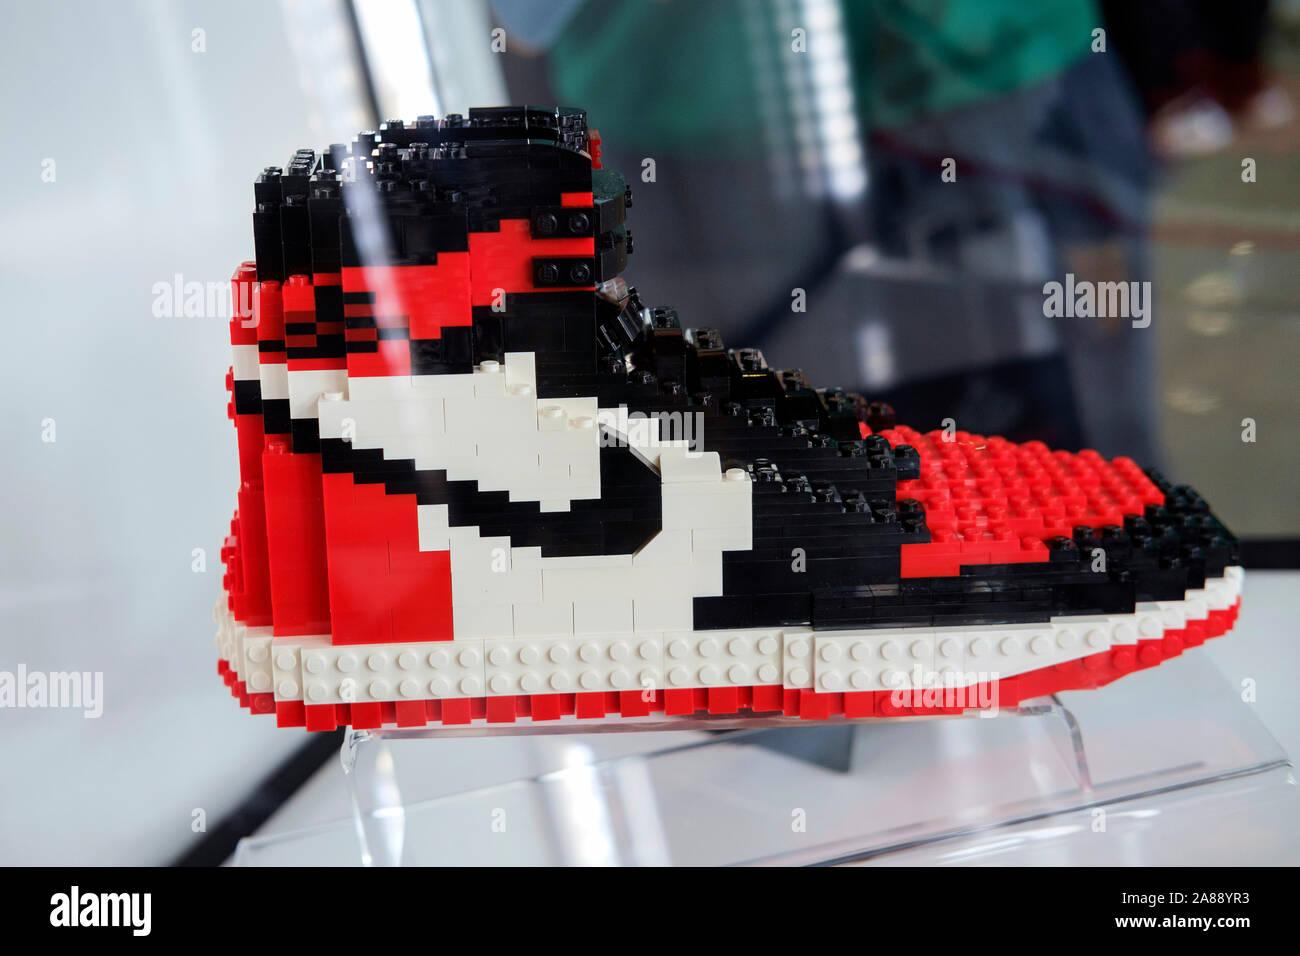 Nike Training Shoes Stockfotos & Nike Training Shoes Bilder